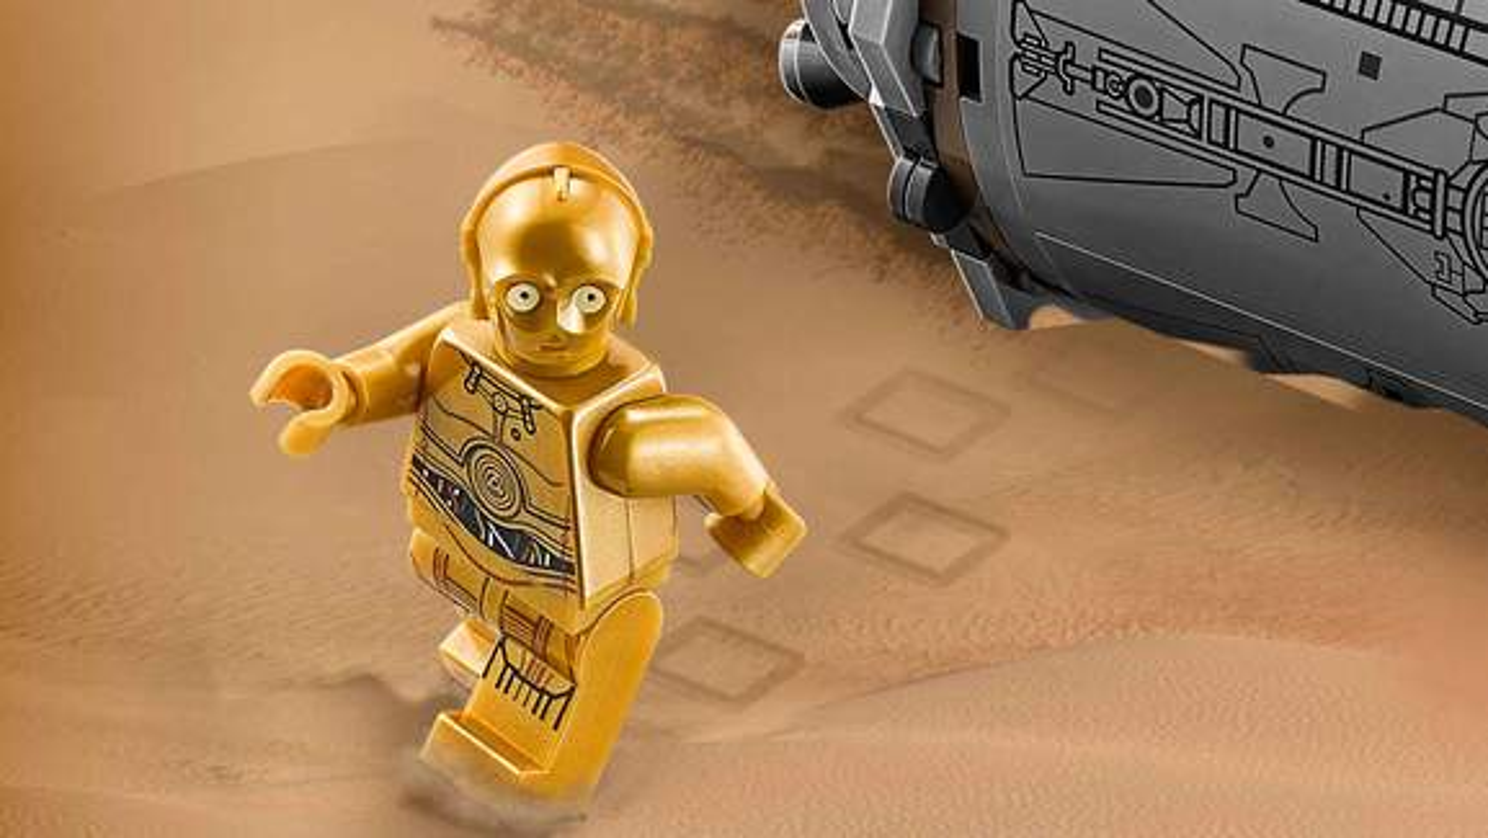 lego star wars c3po